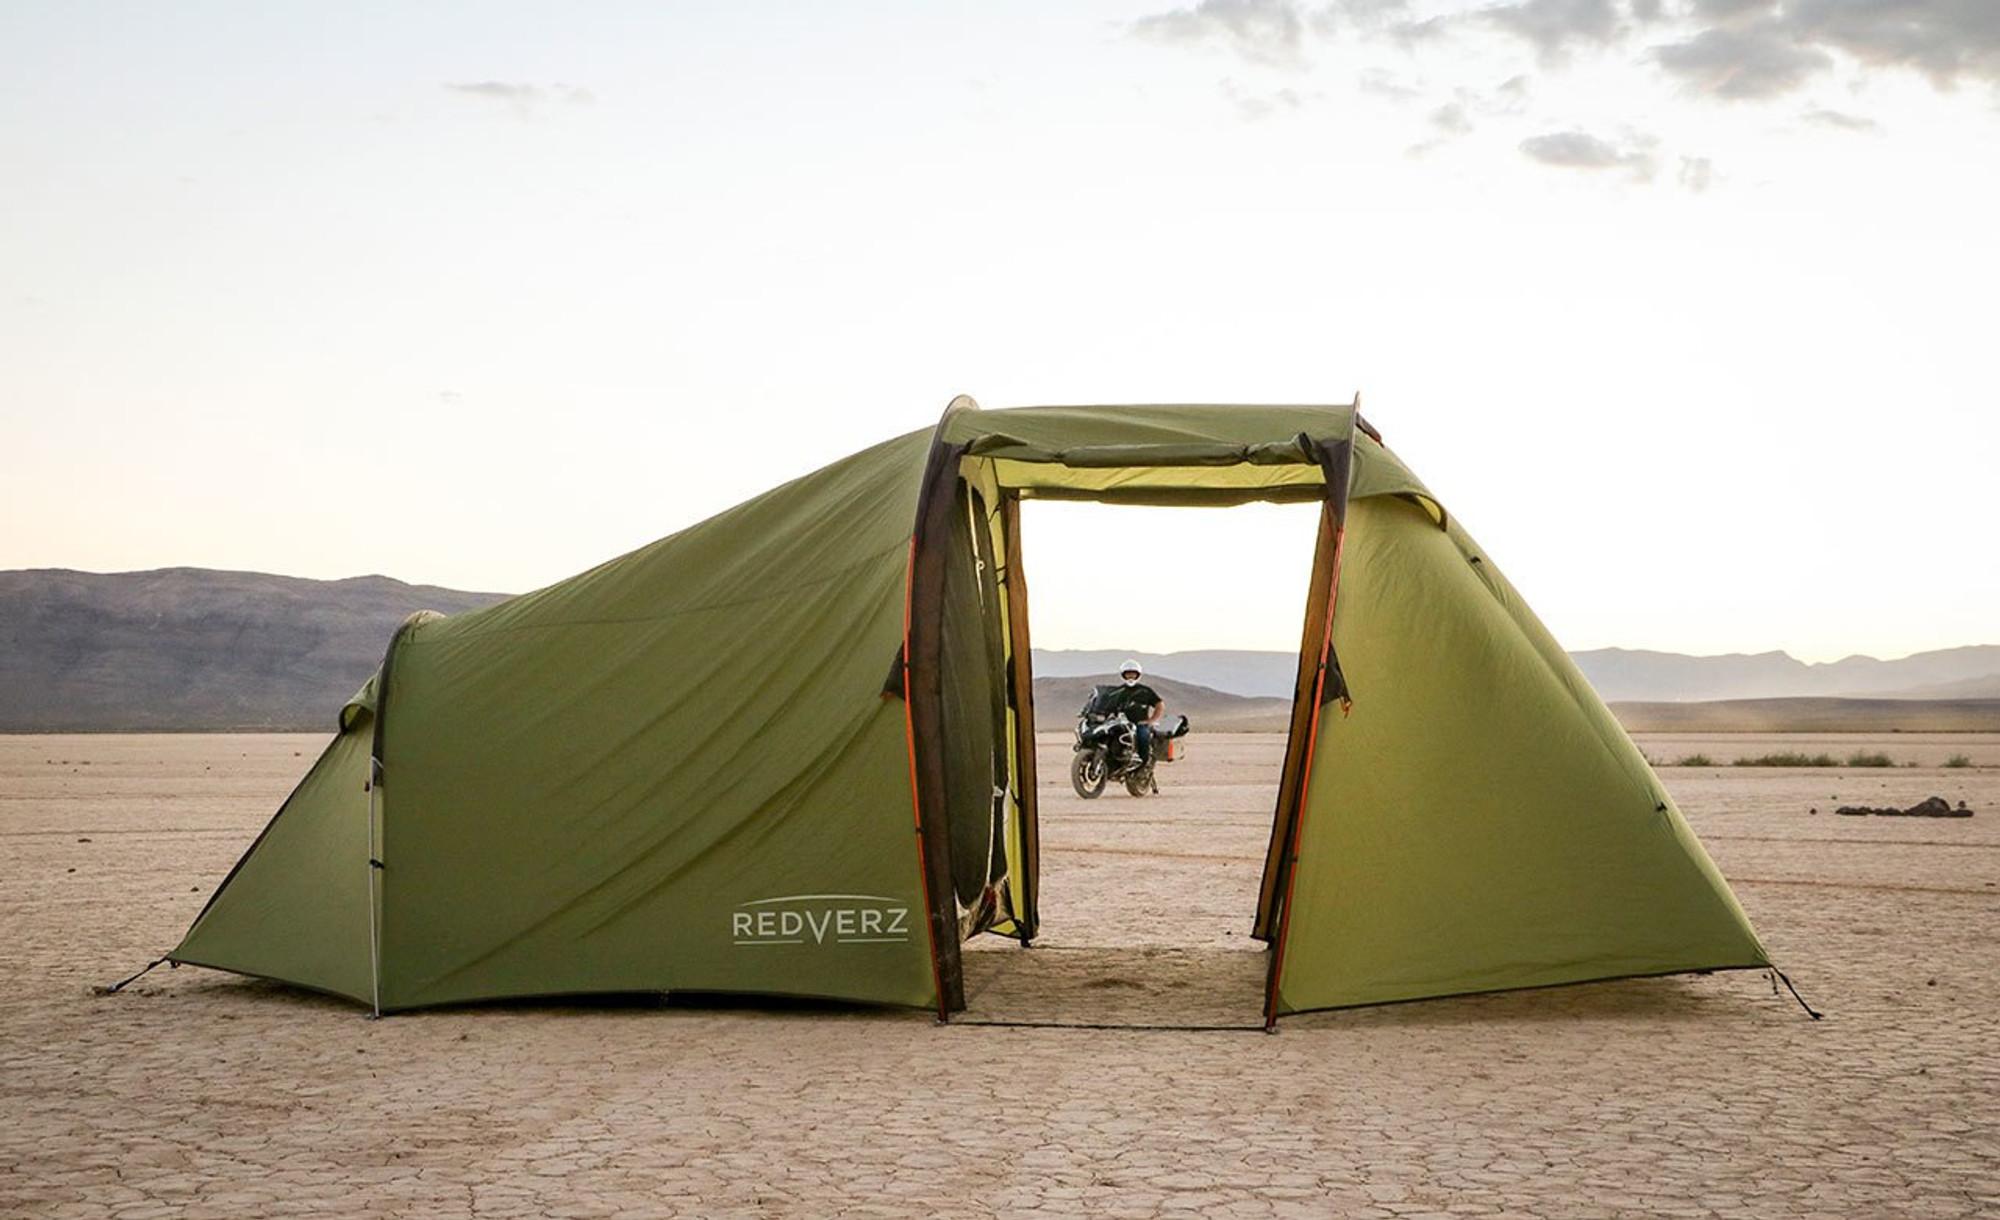 Redverz Atacama Expedition Motorcycle Tent ... & Redverz Gear - Atacama Expedition Motorcycle Tent